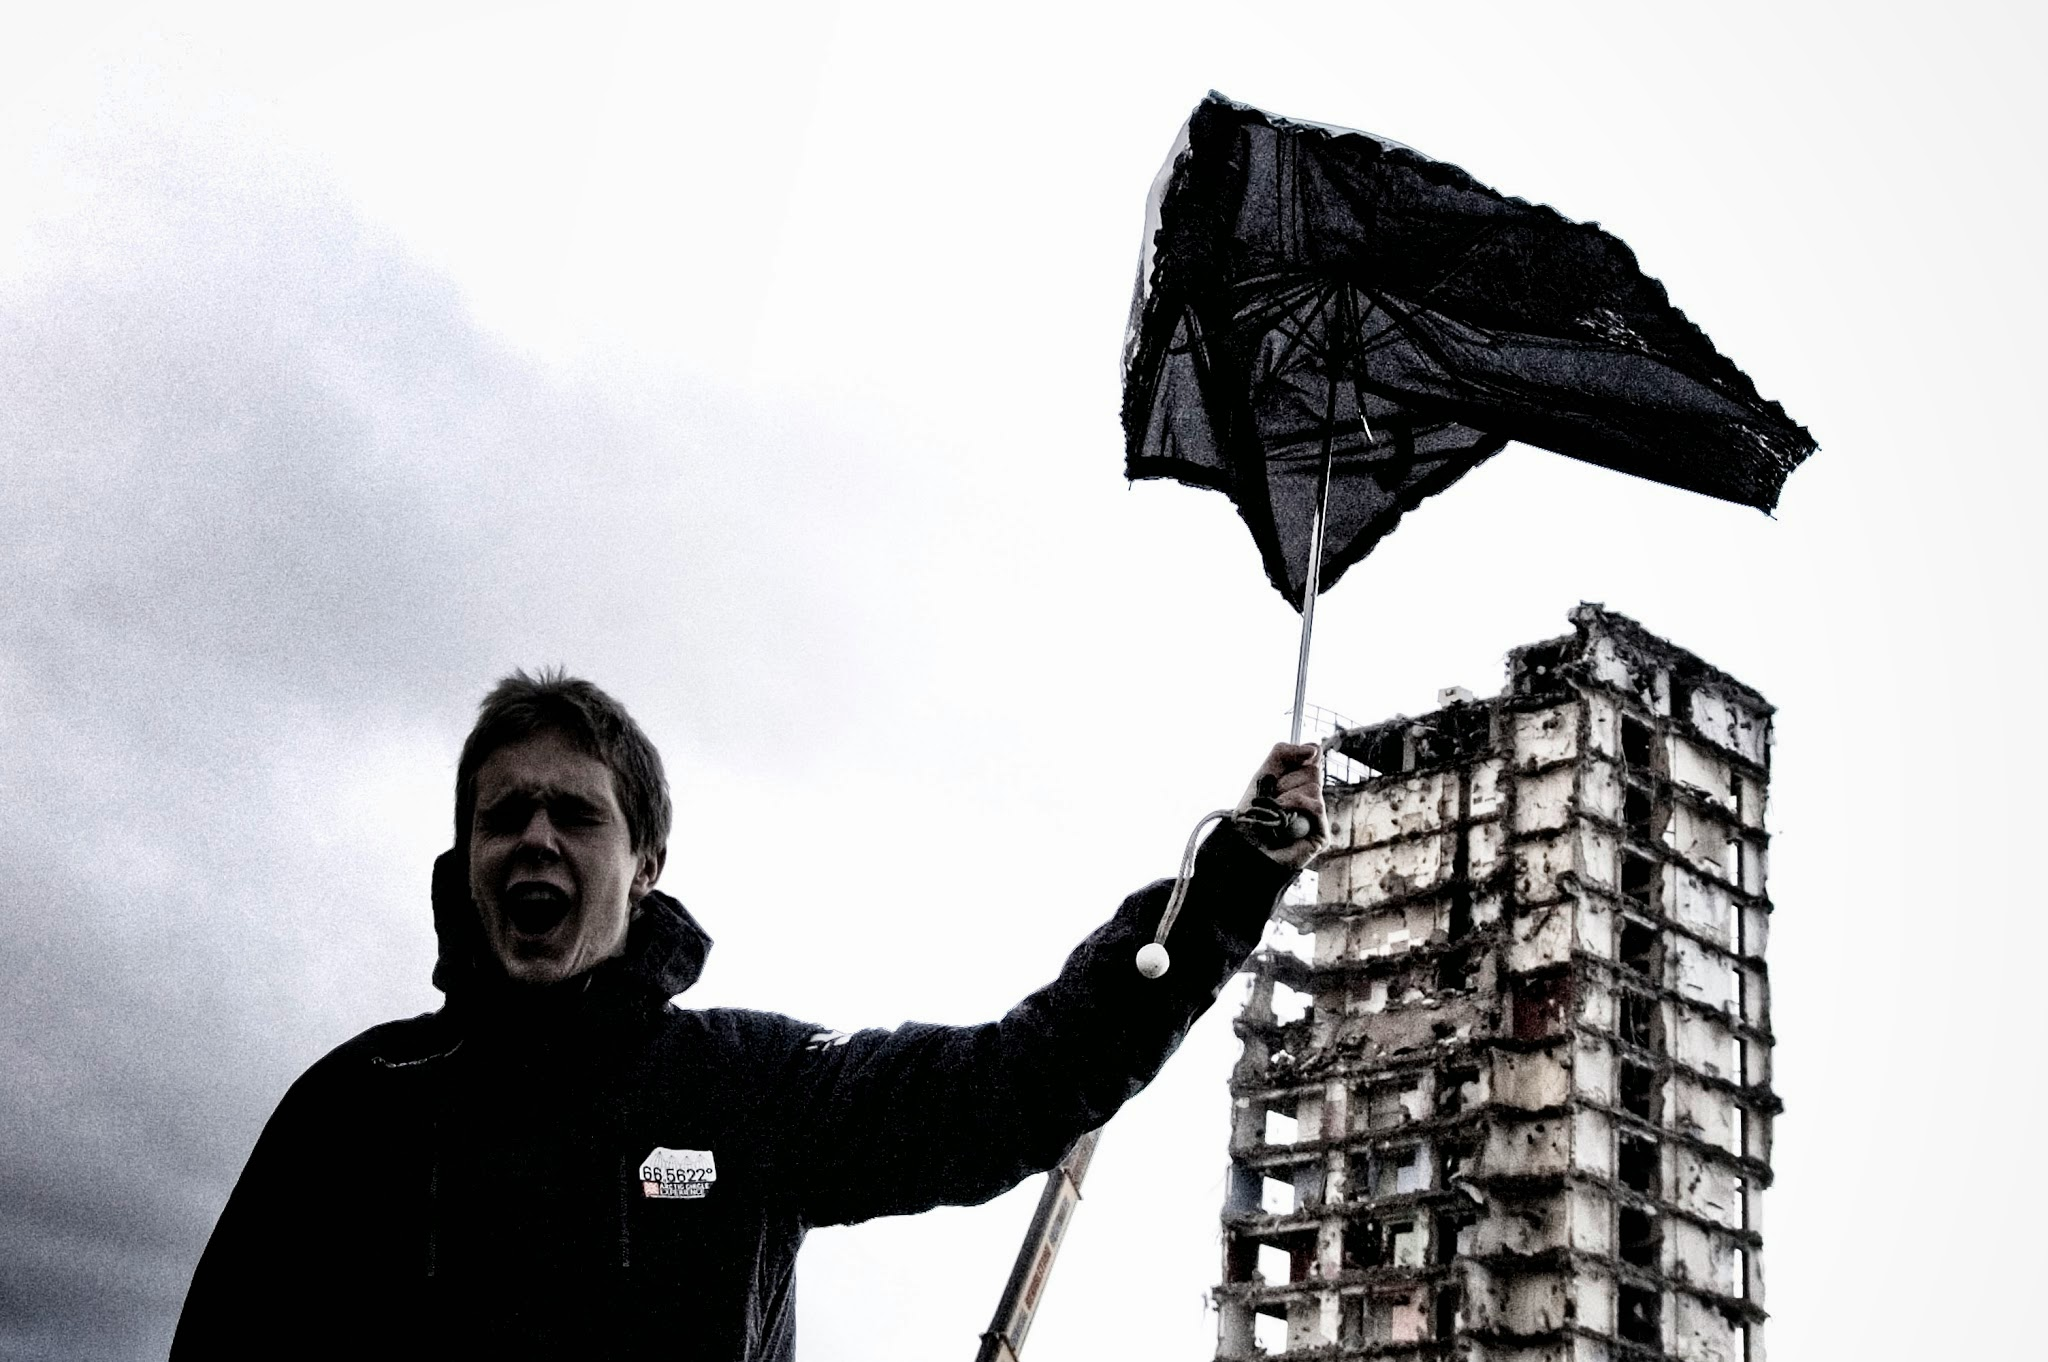 Photo: ...rewolucjach